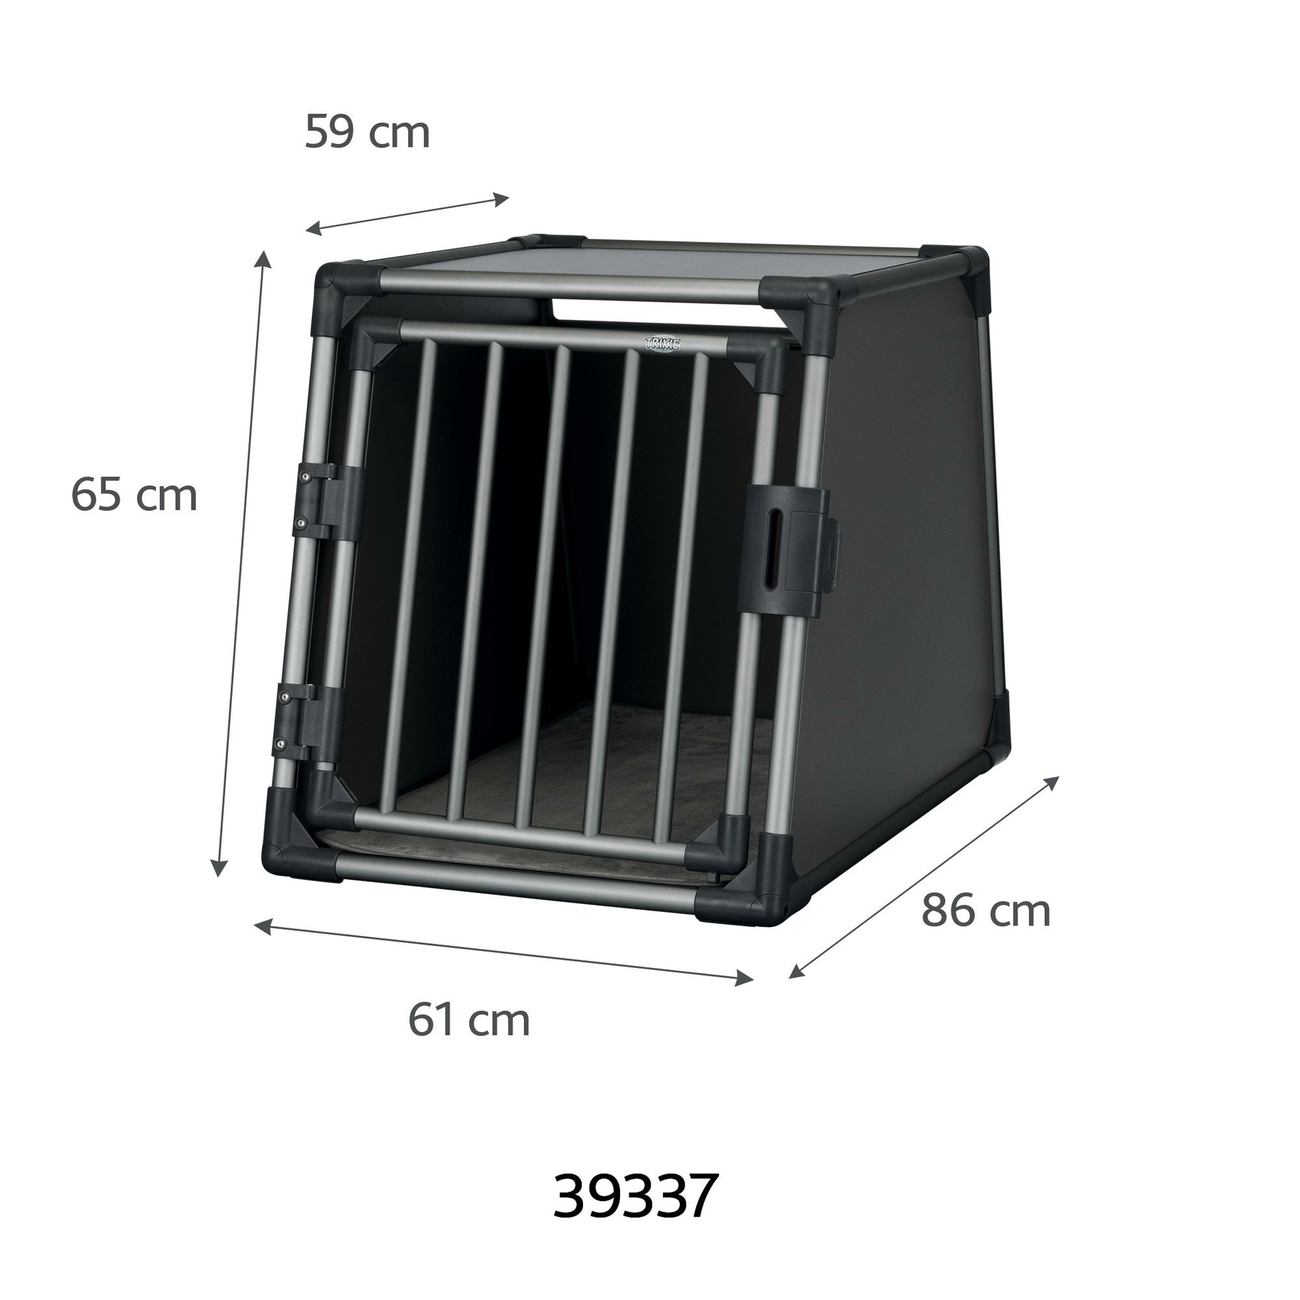 Trixie Autobox für Hunde aus Aluminium, graphit 39335, Bild 6